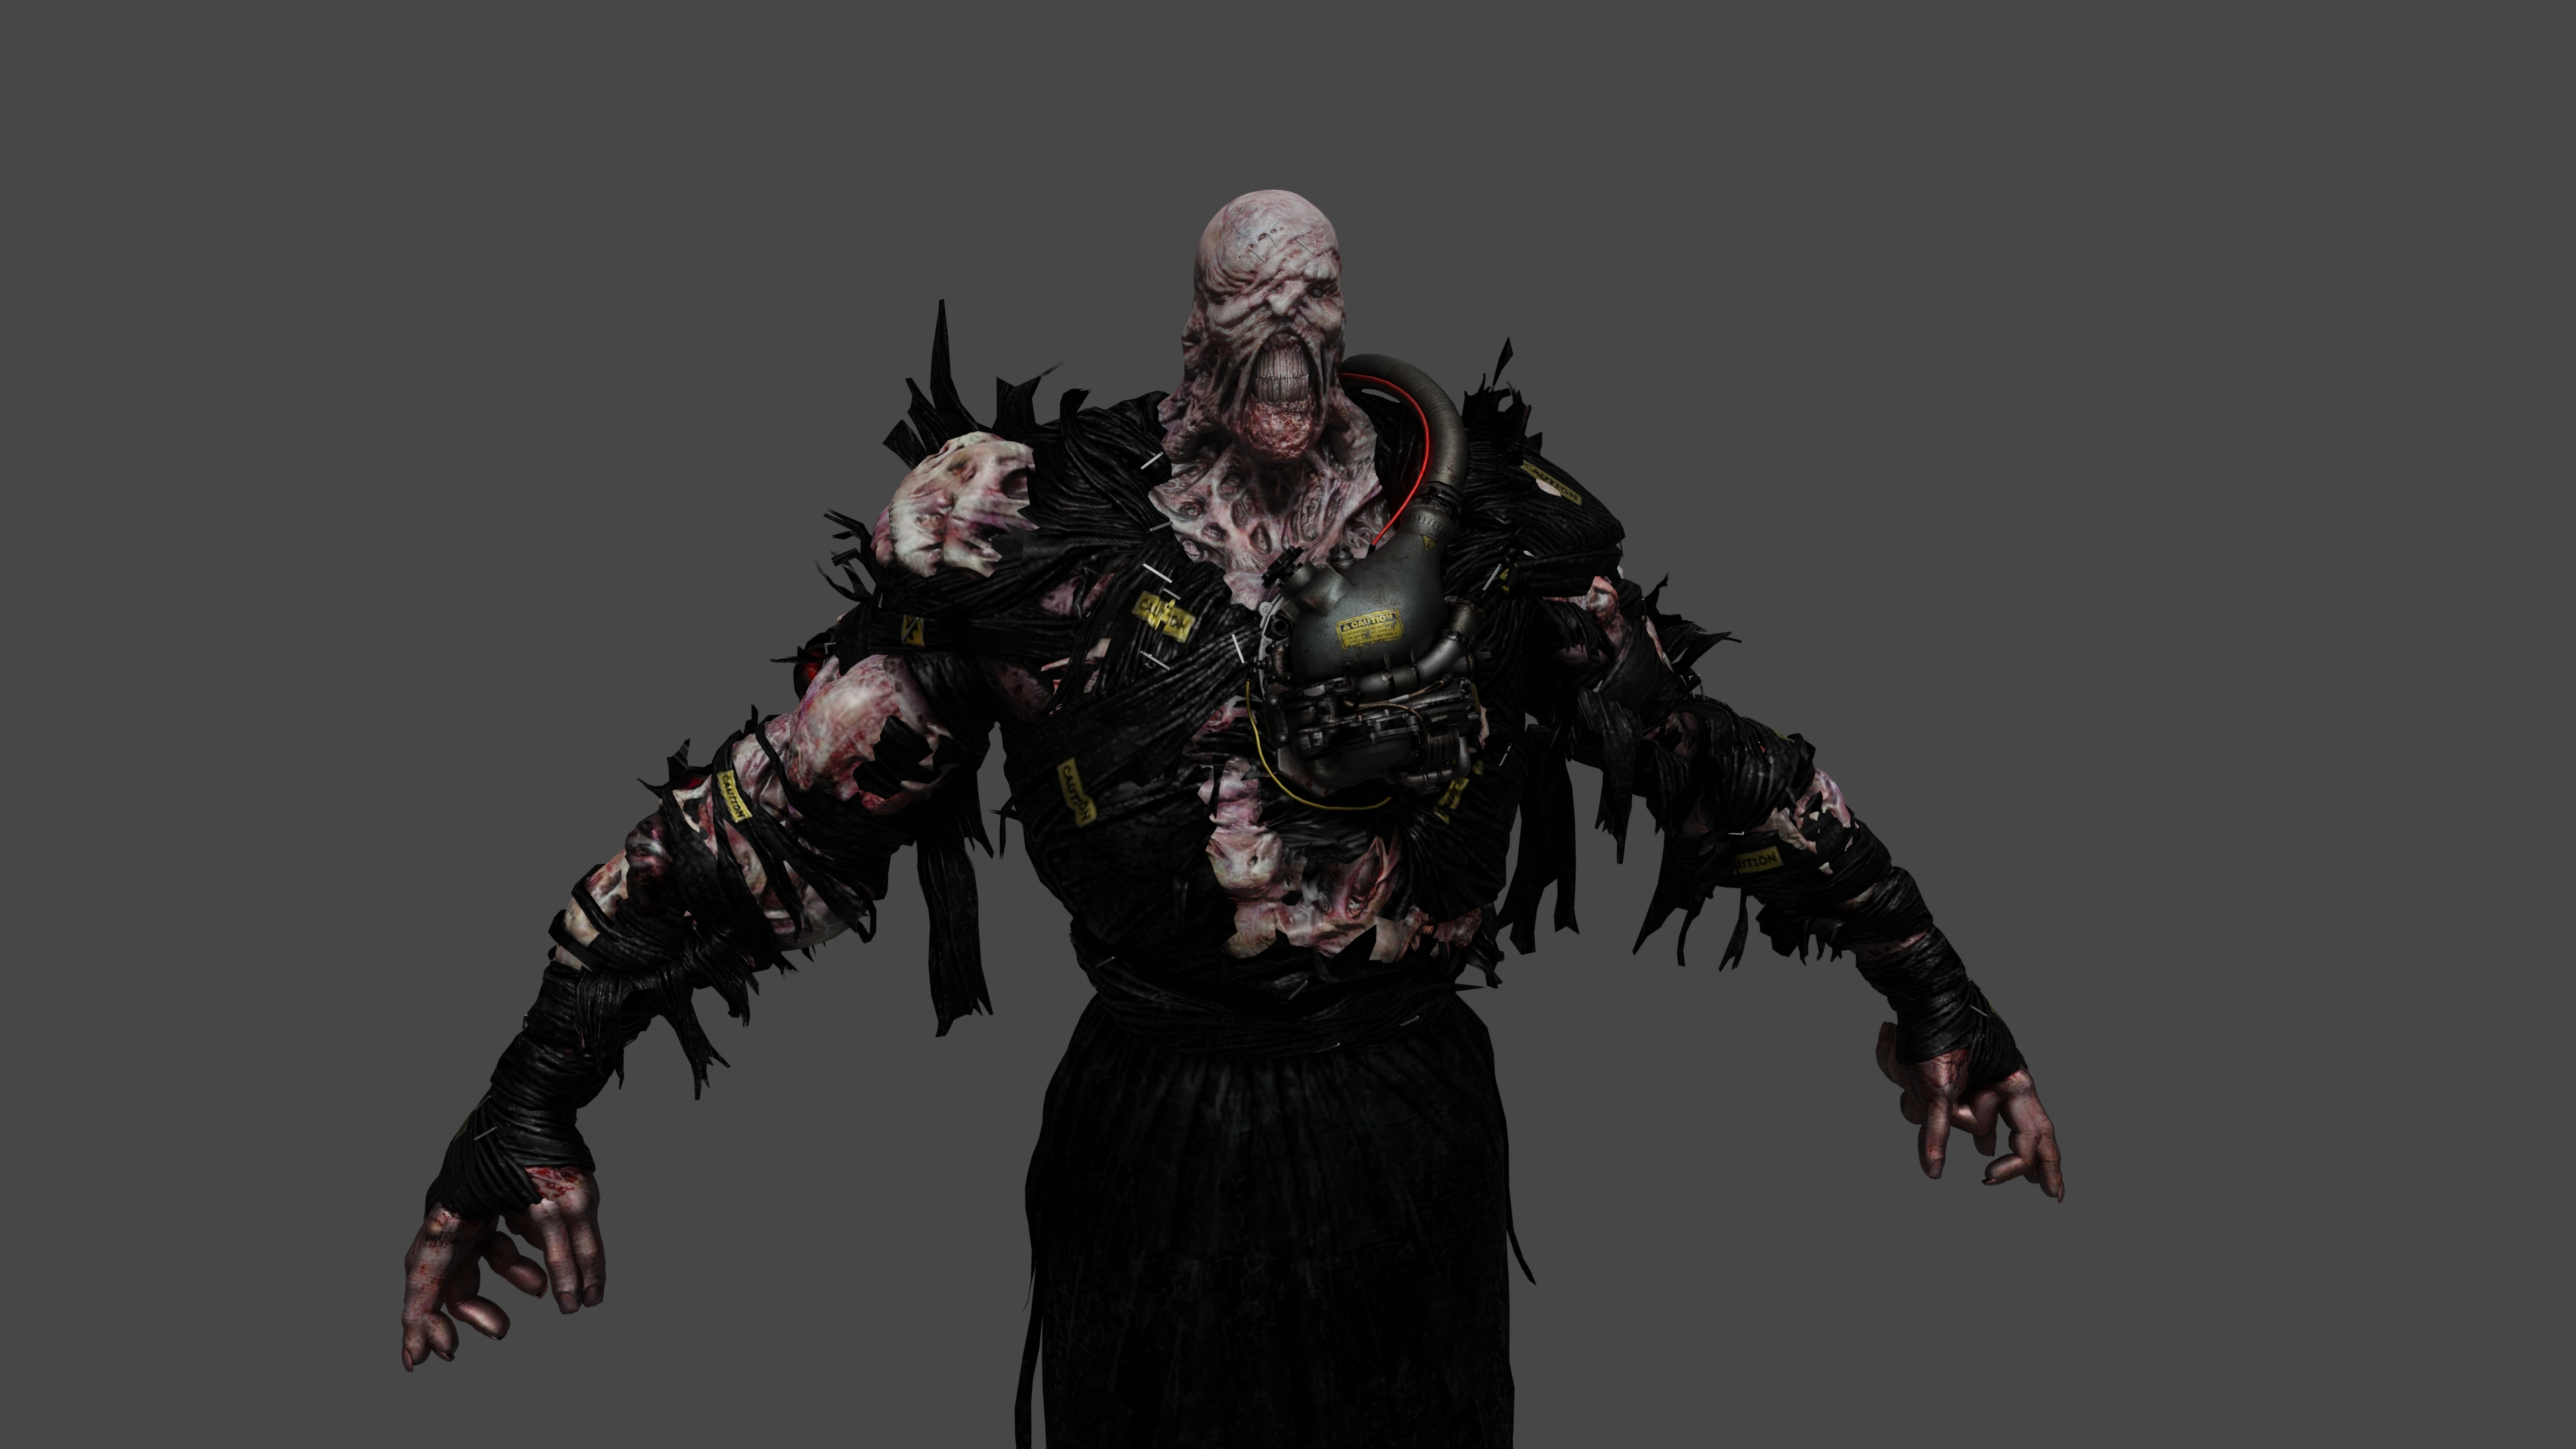 Resident Evil 3 Remake Nemesis By Mattcroft008 On Deviantart